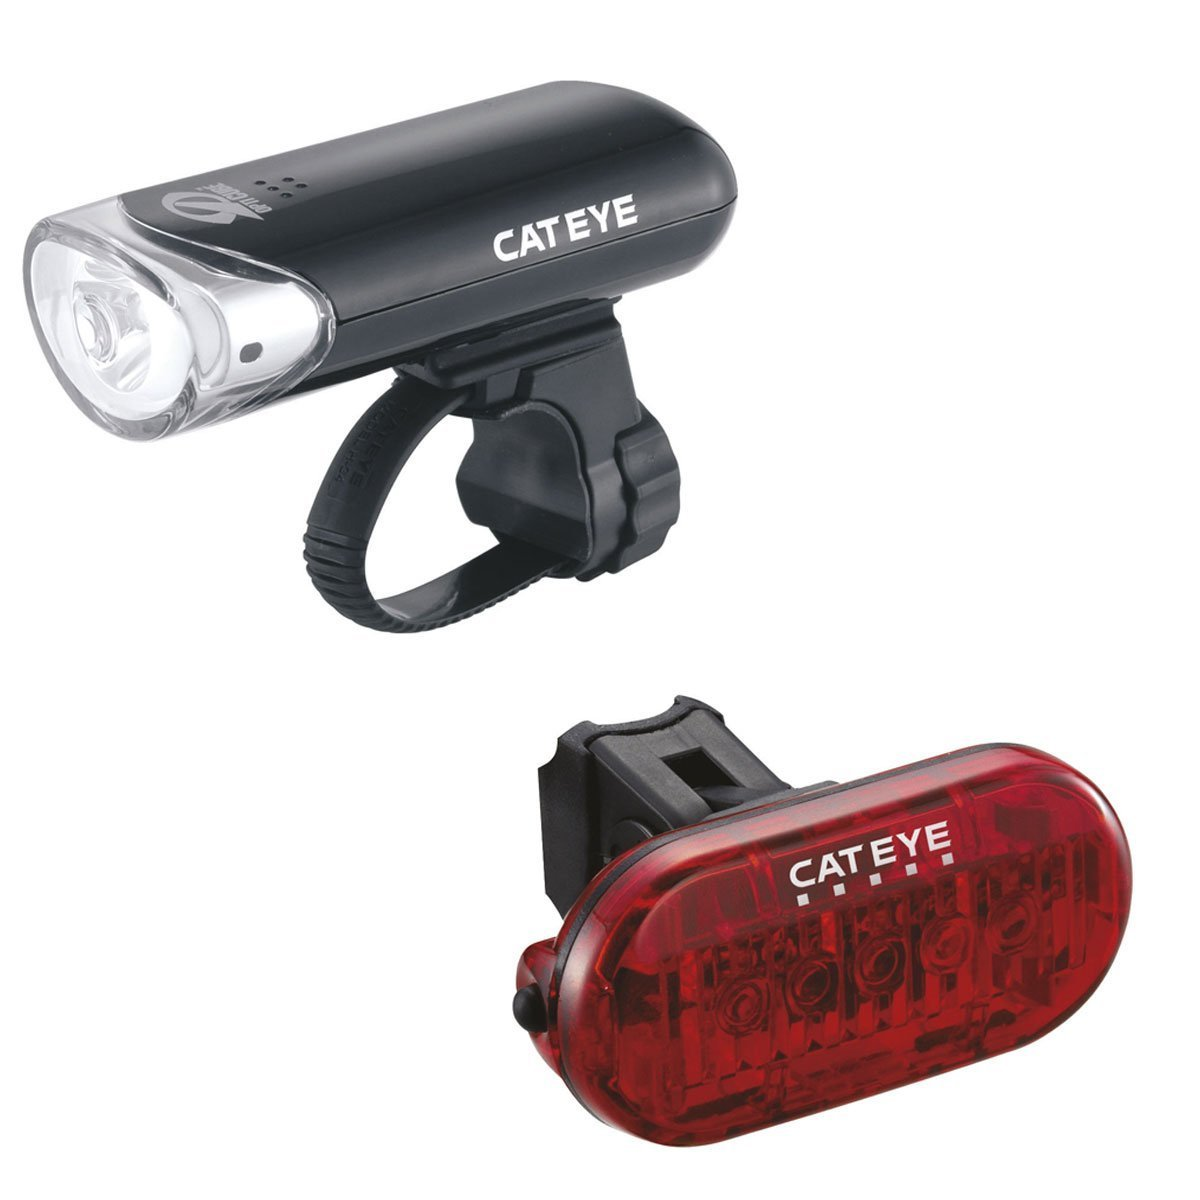 Cateye El135 /& Omni 5 Front And Rear Bike Light Set